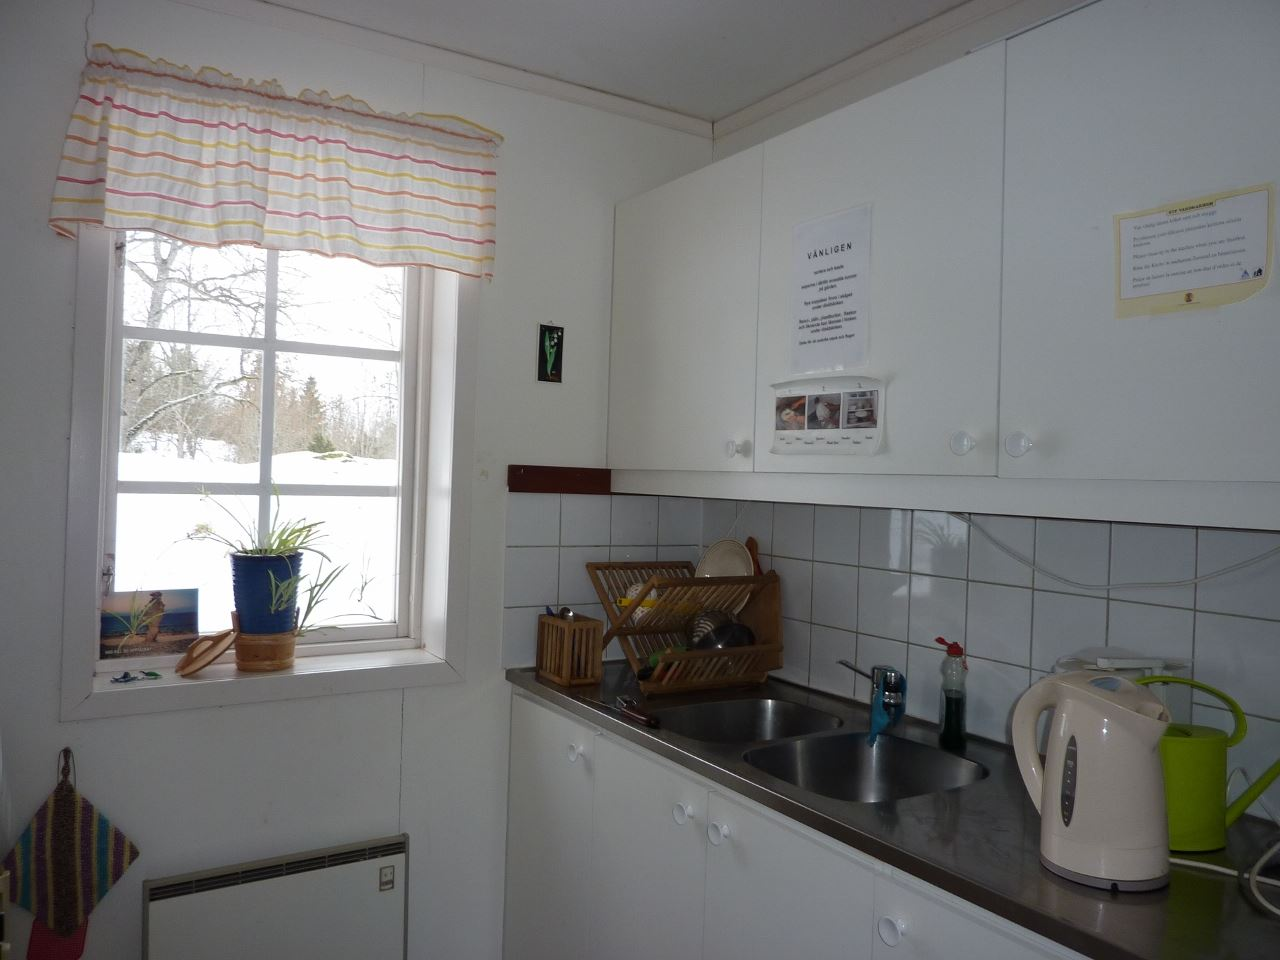 Gammel-Gränome, STF Hostel